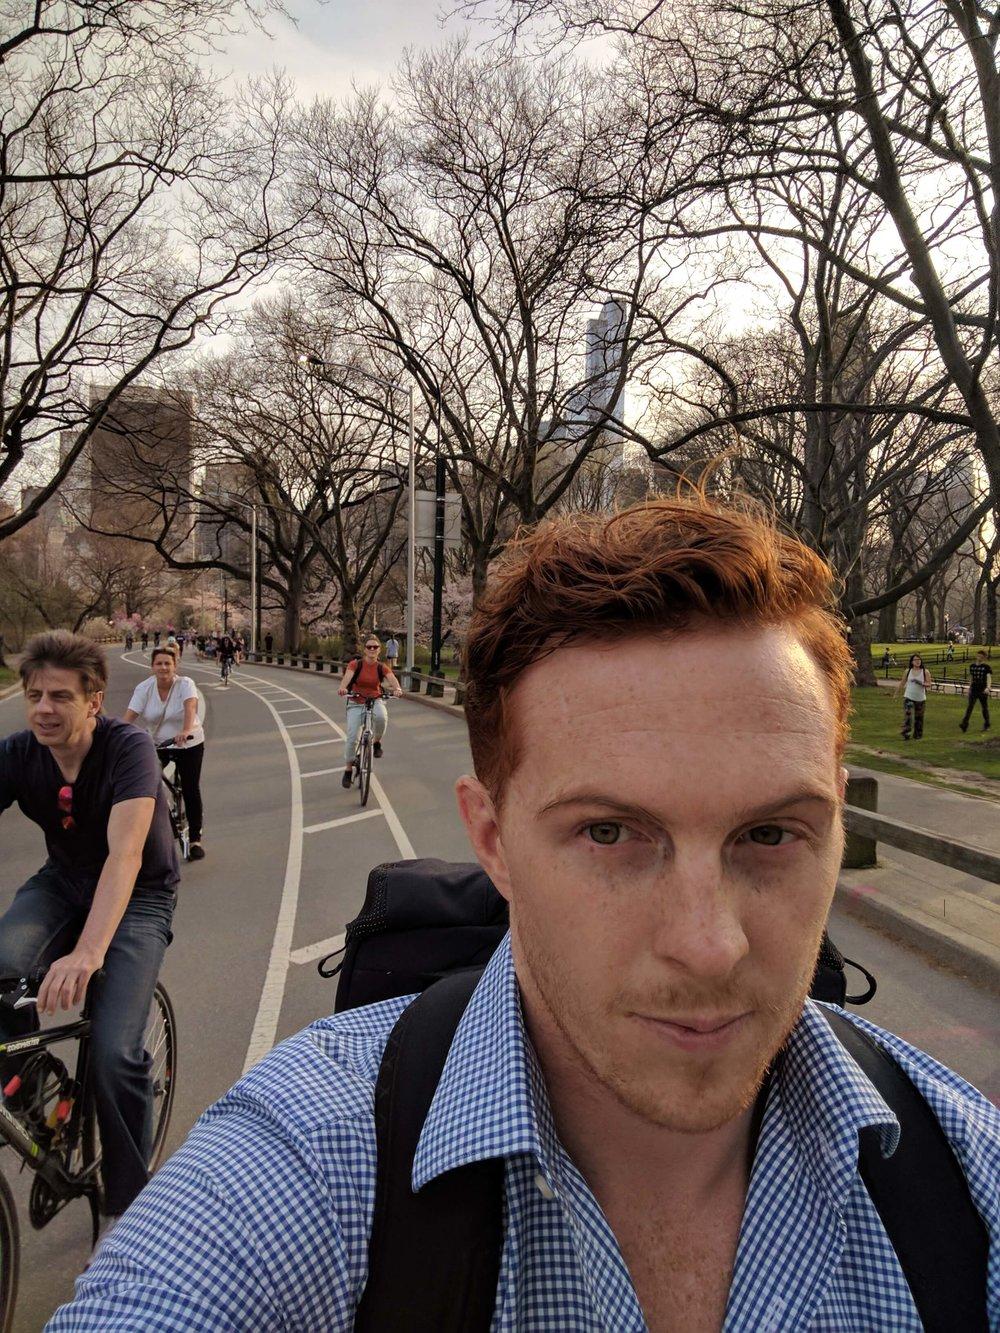 Bike Riding Central Park